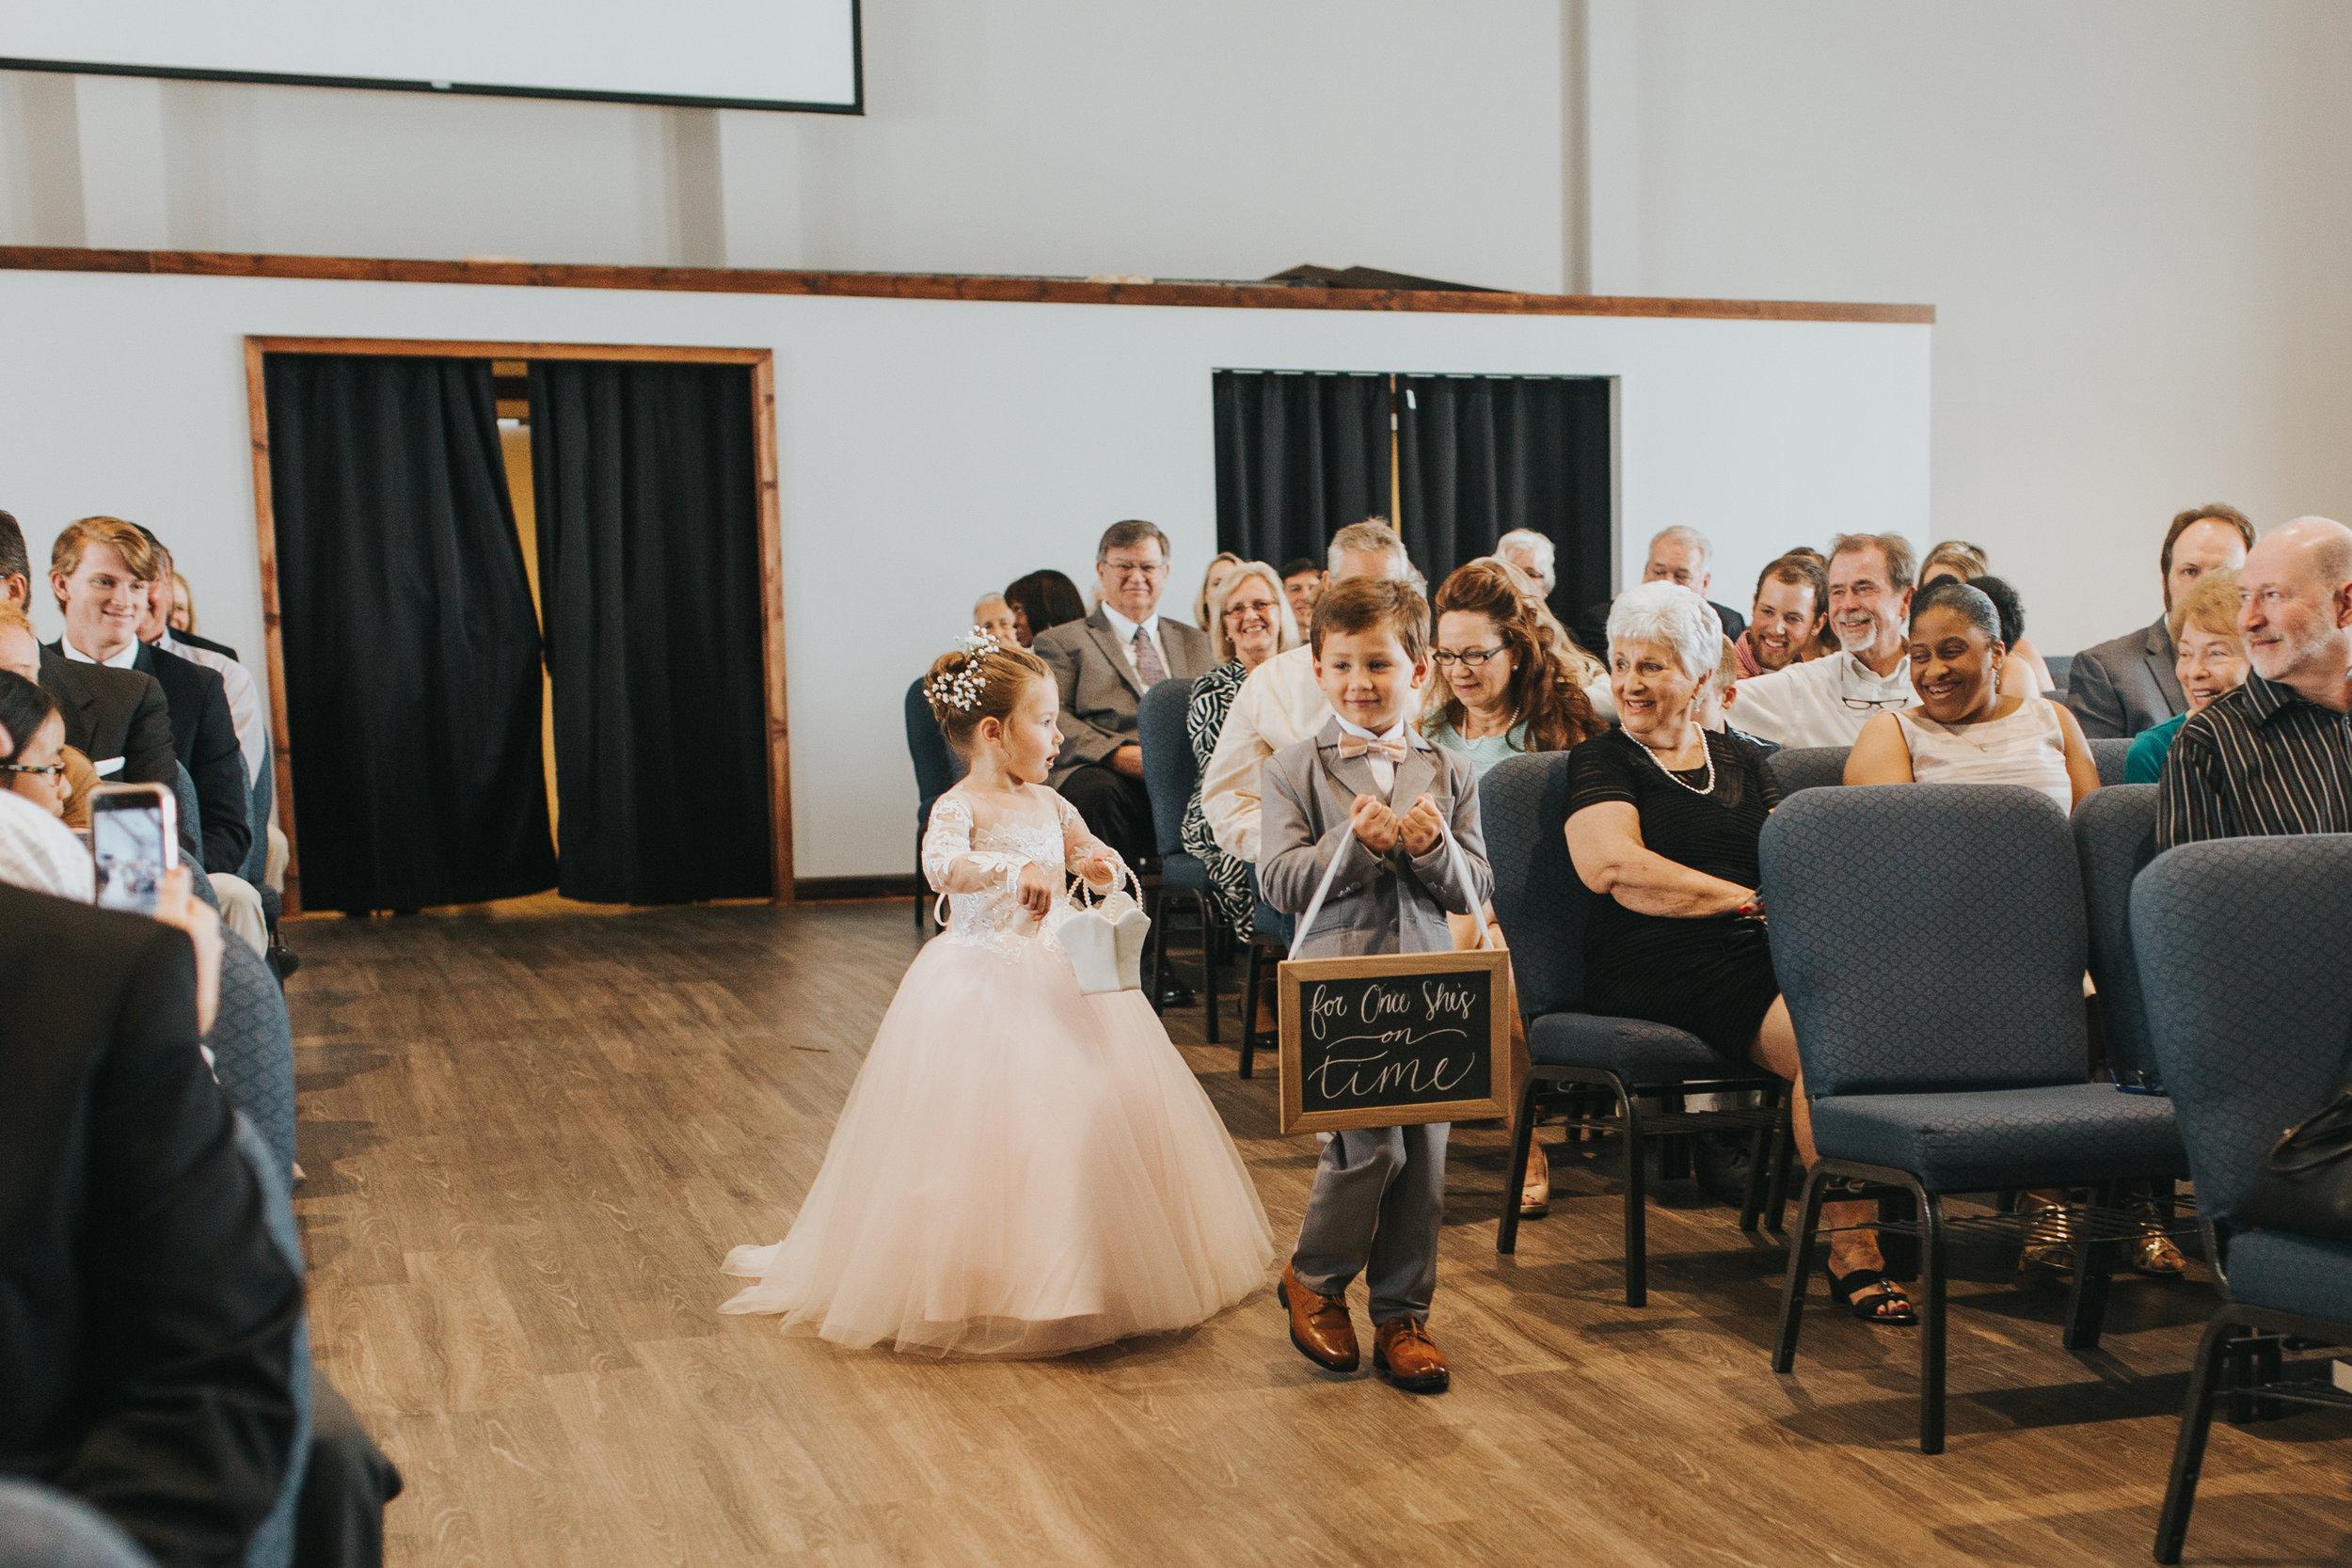 Richmond wedding photographer, Virginia wedding photographer, Destination wedding photographer, Savannah Georgia wedding photographer, Charlottesville wedding photographer, 456.JPG